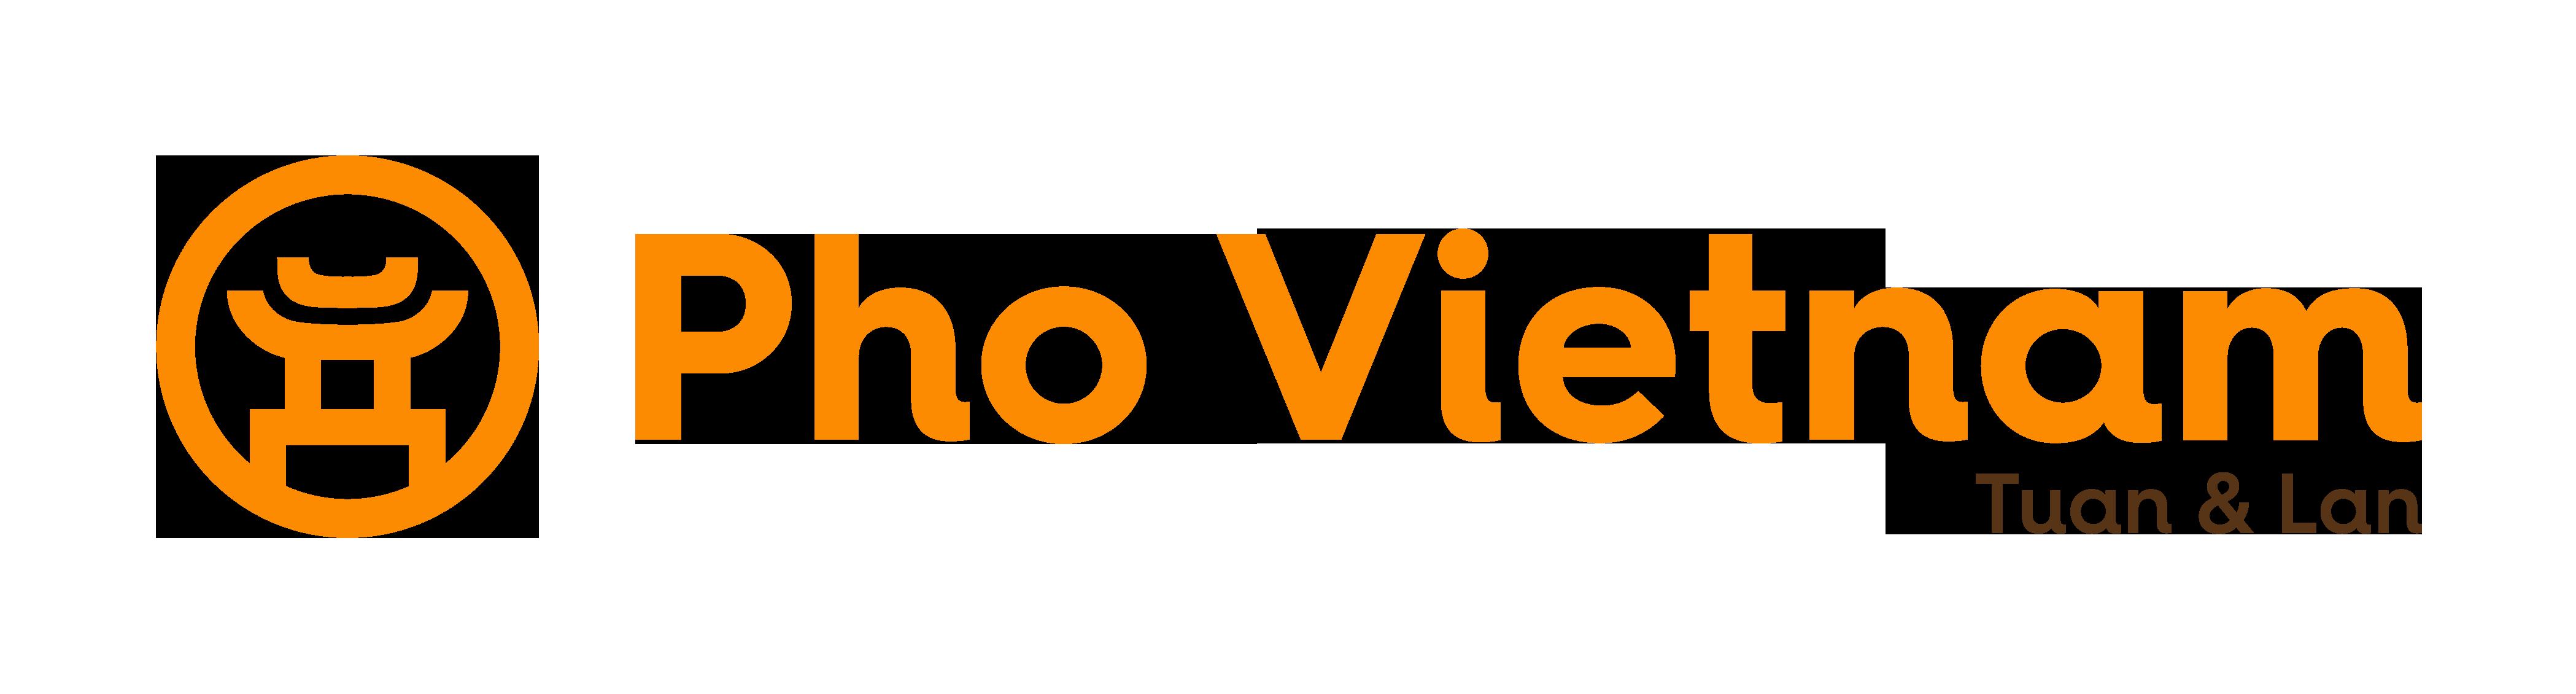 Pho_Vietnam_Tuan_a_Lan_Praha_Logo_Veronika_Rut